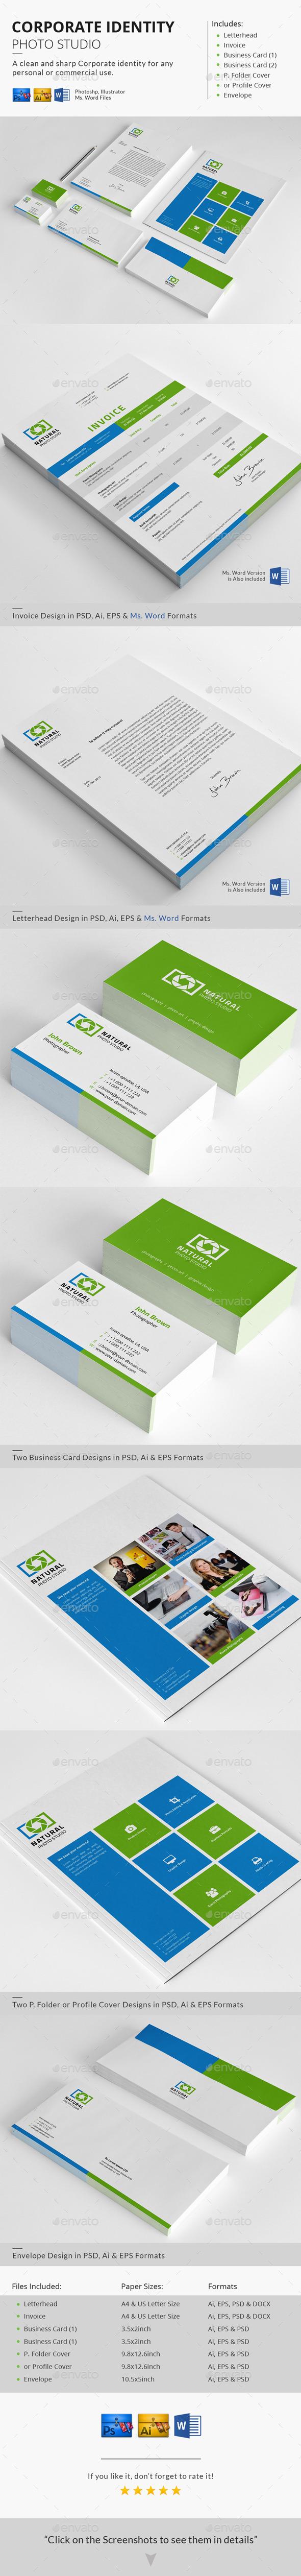 Corporate Identity - Photo Studio - Stationery Print Templates